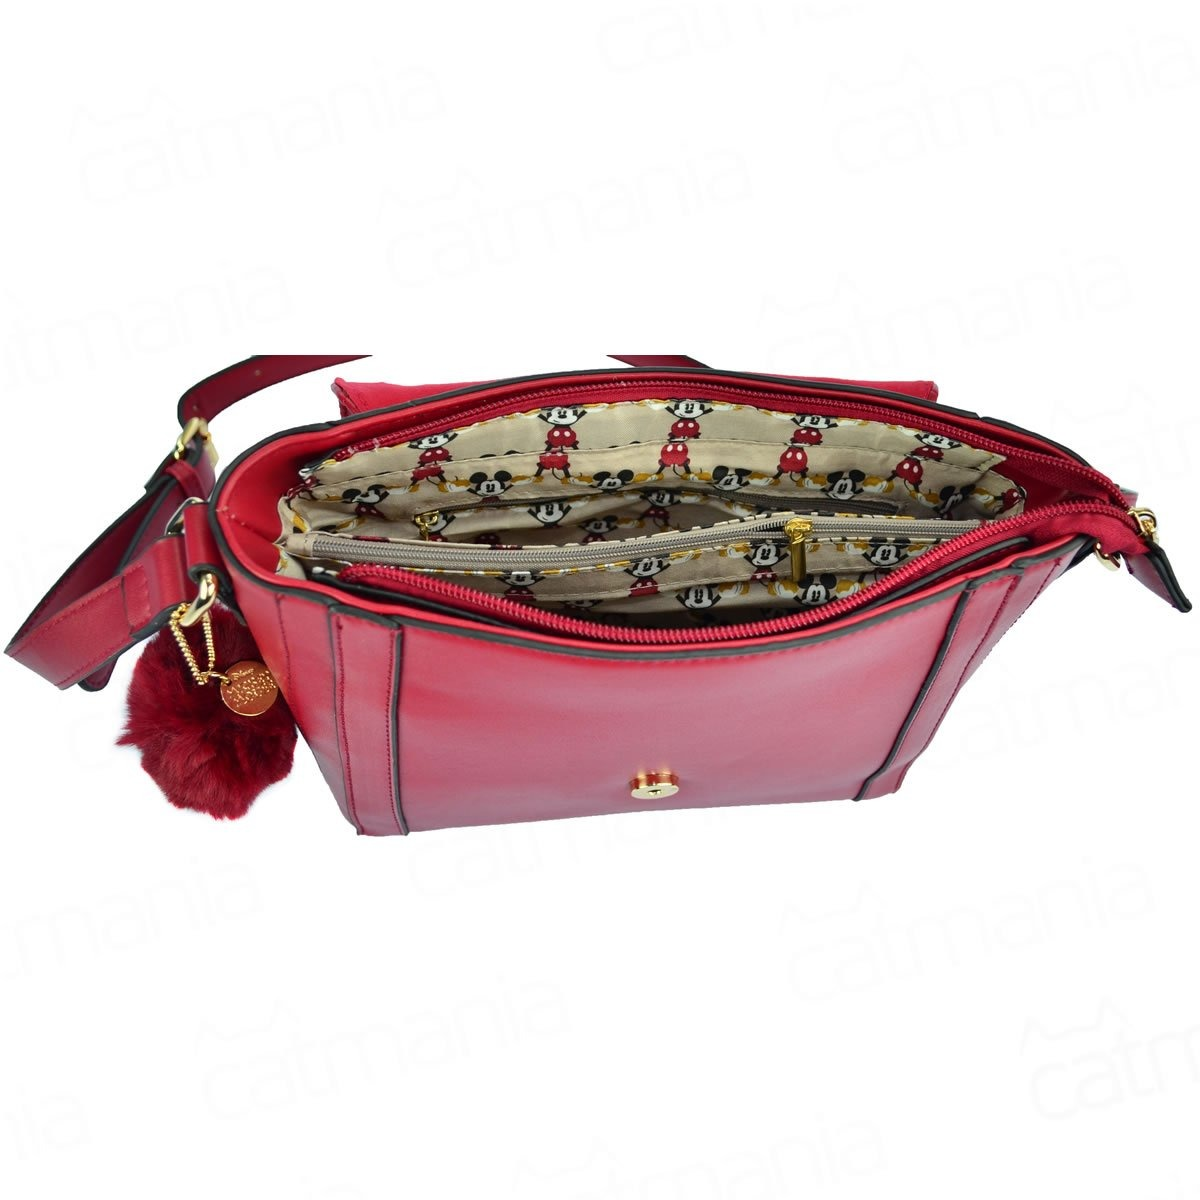 7a9485c96 Bolsa Transversal Mickey Head Pin Com Pompom - R$ 167,90 em Mercado ...